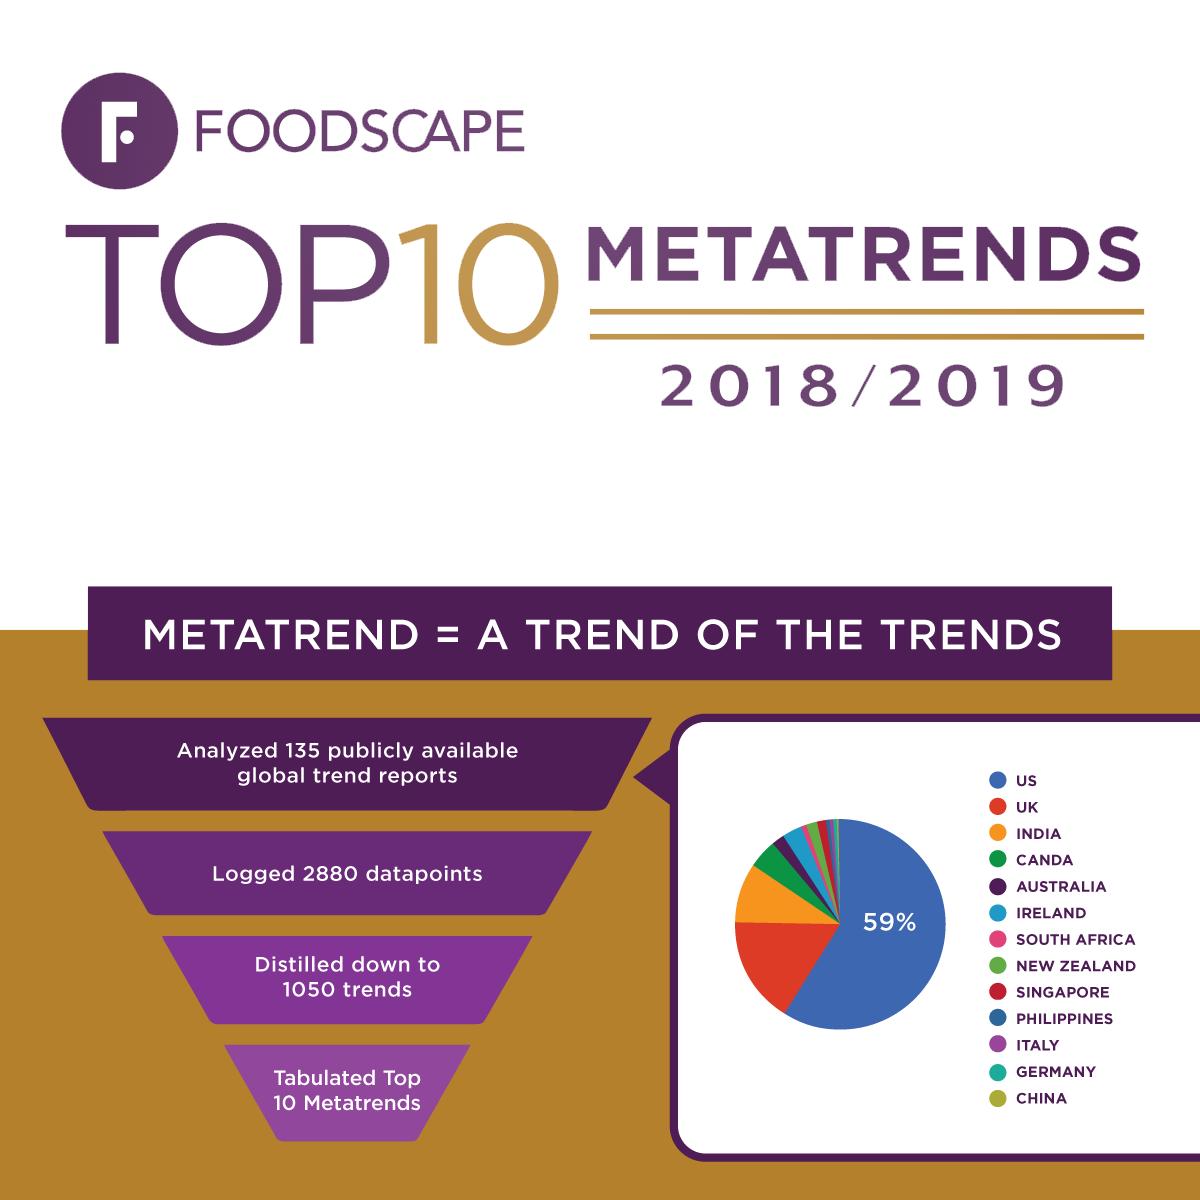 Foodscape METATRENDS™